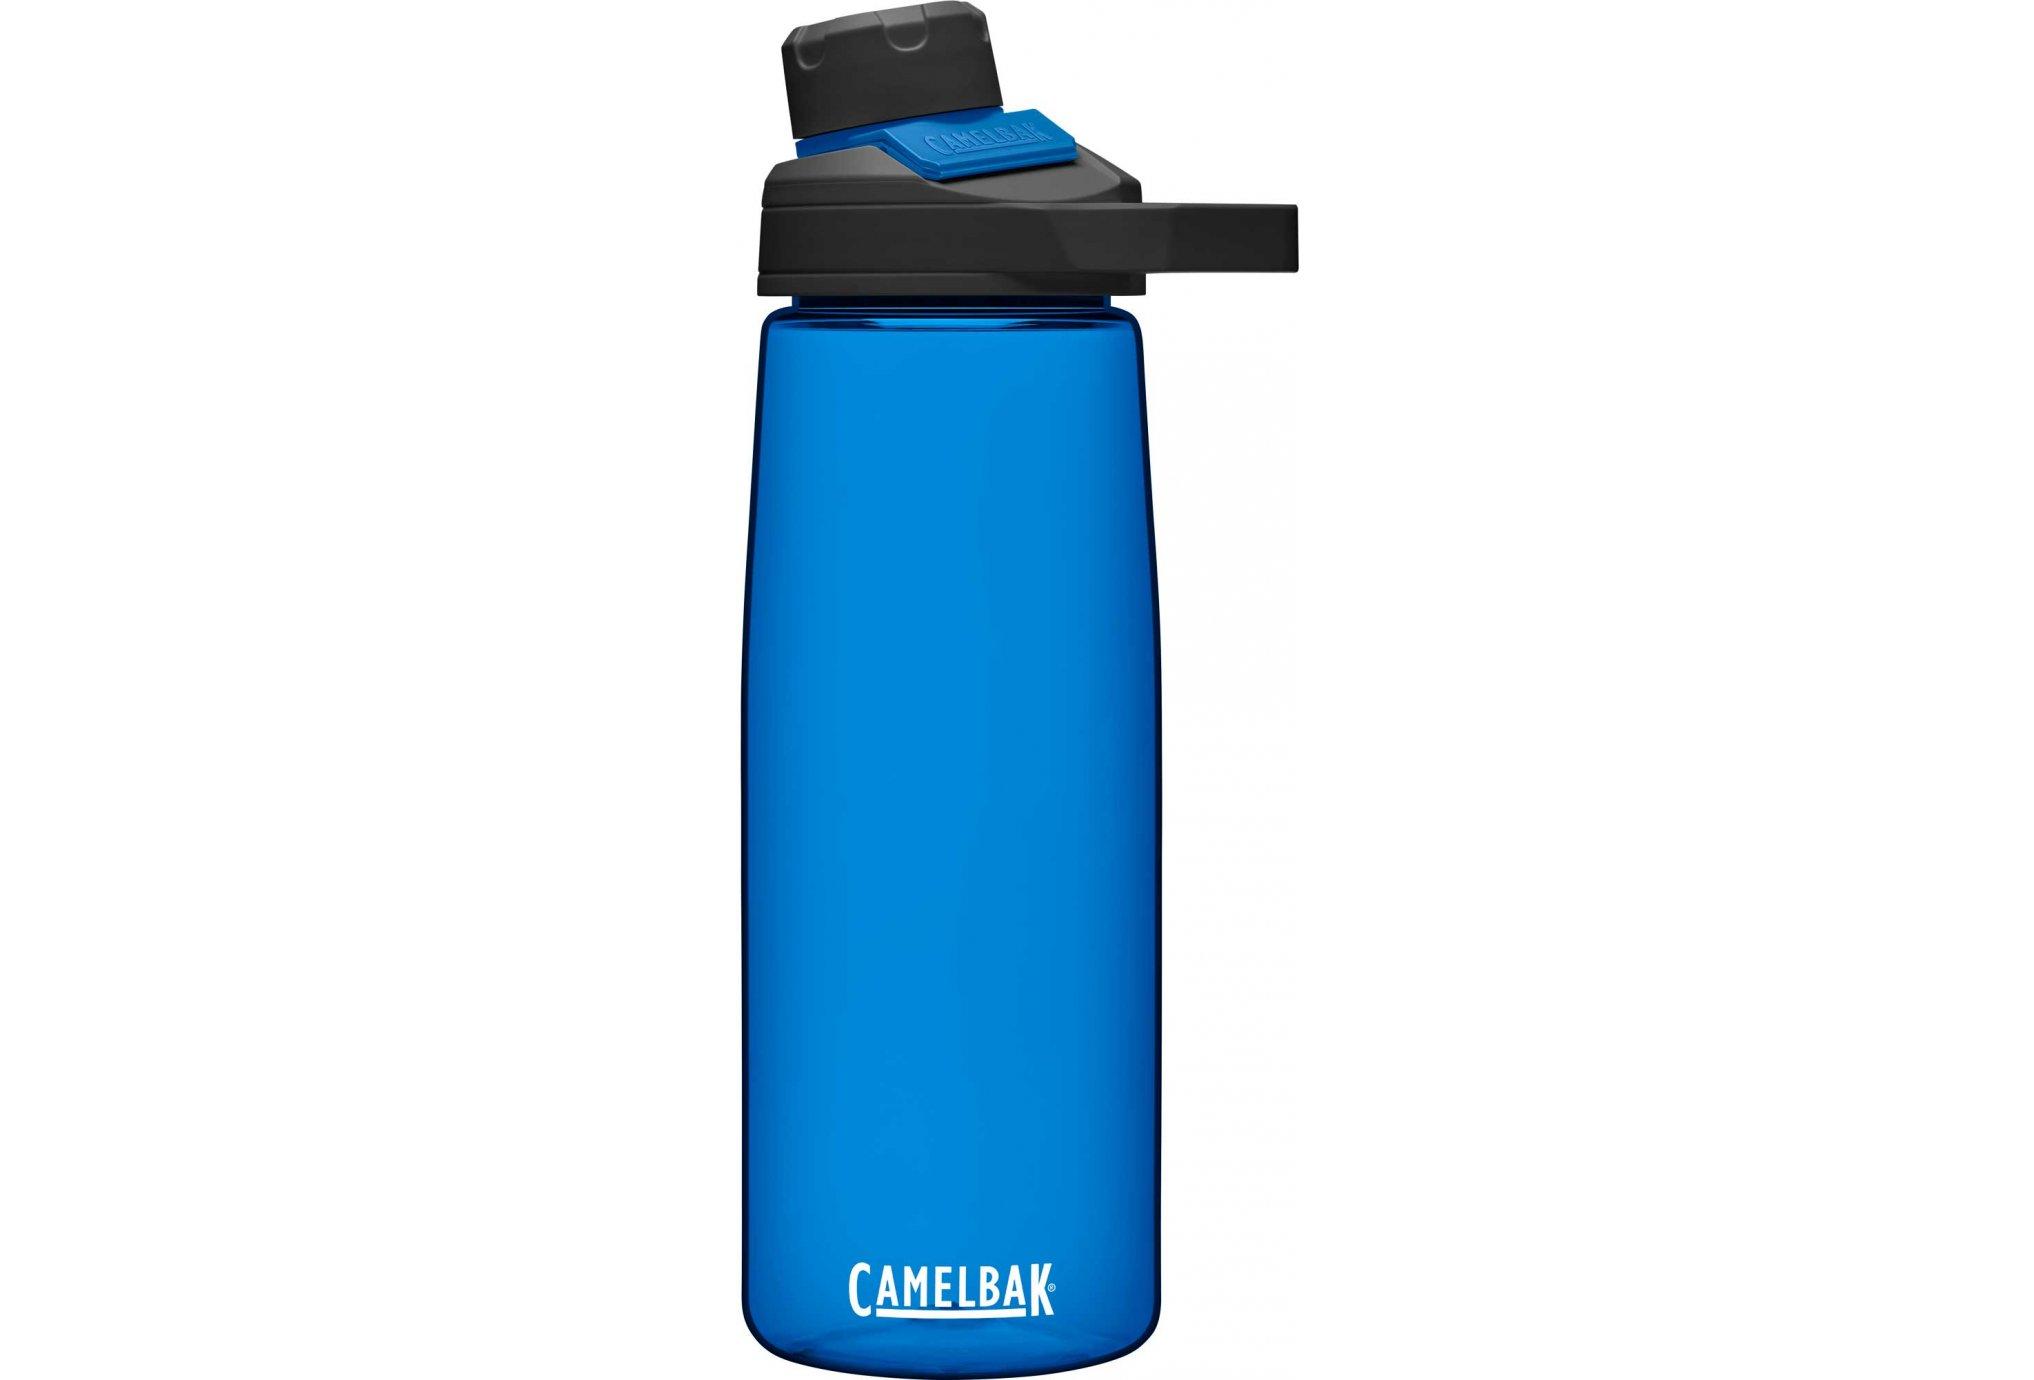 Camelbak Gourde Chute Mag 0.75L Sac hydratation / Gourde